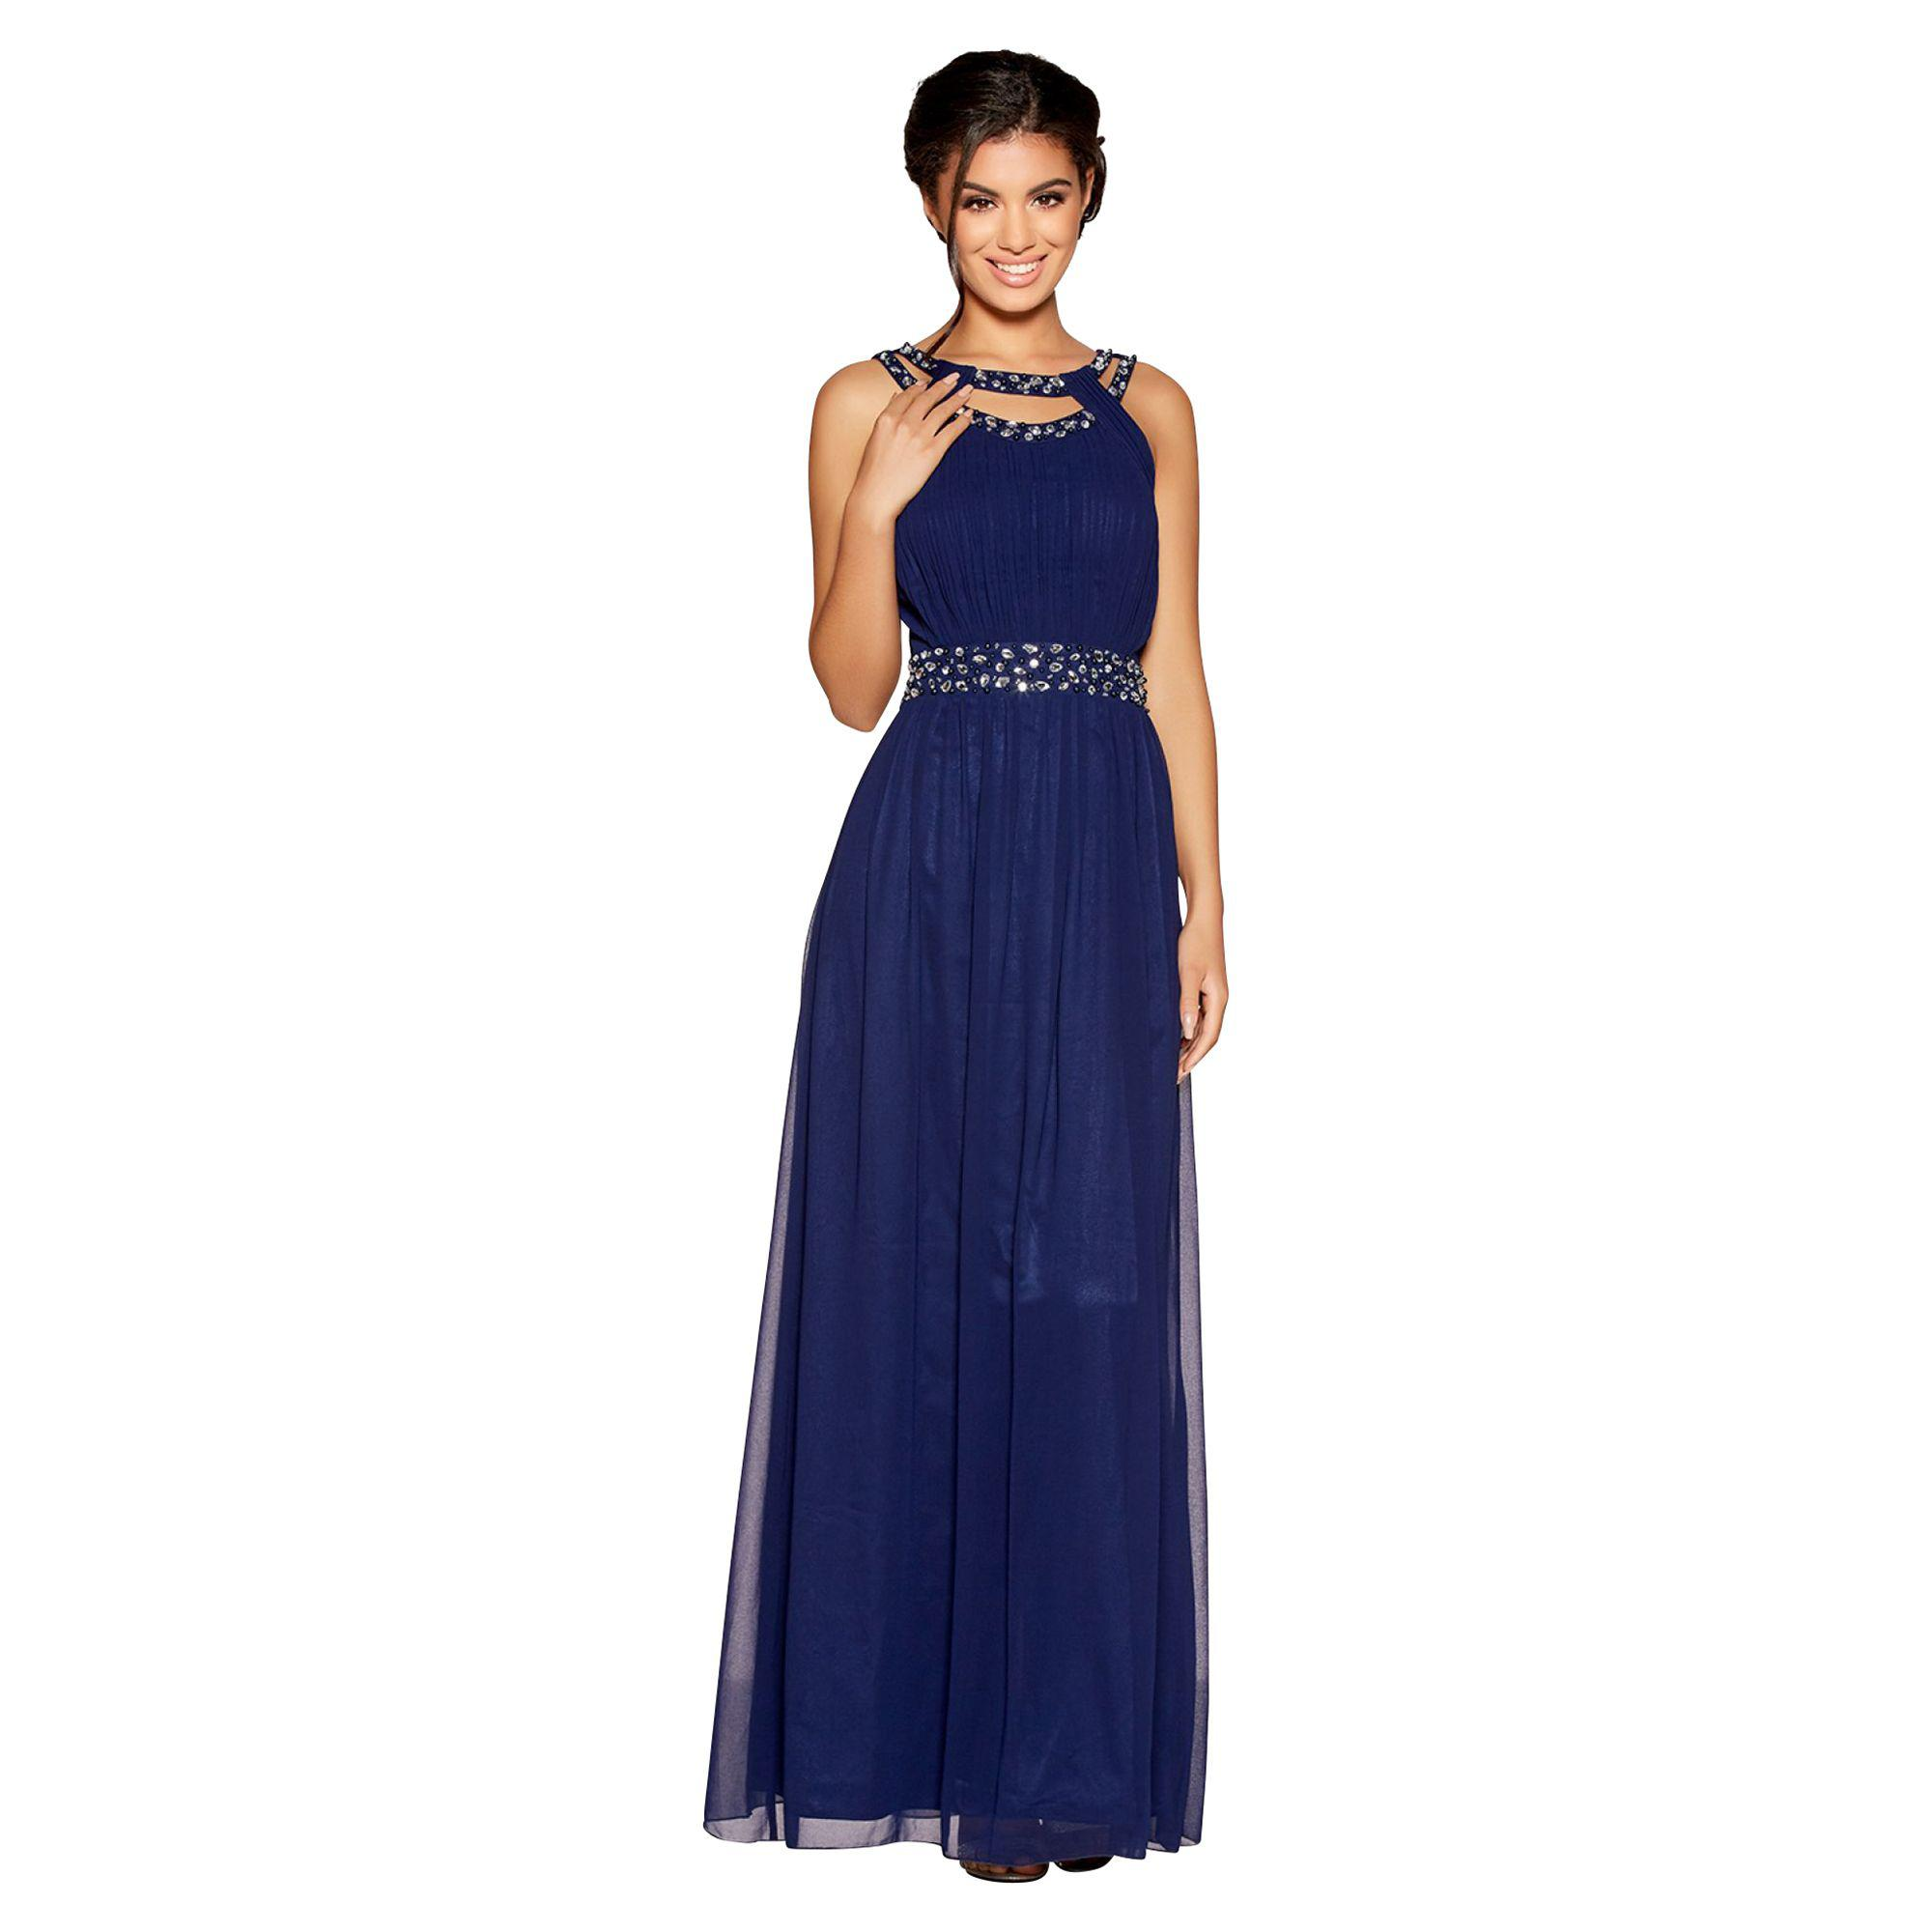 1f1c3f6029 Quiz Navy Chiffon Round Neck Embellished Maxi Dress in Blue - Lyst